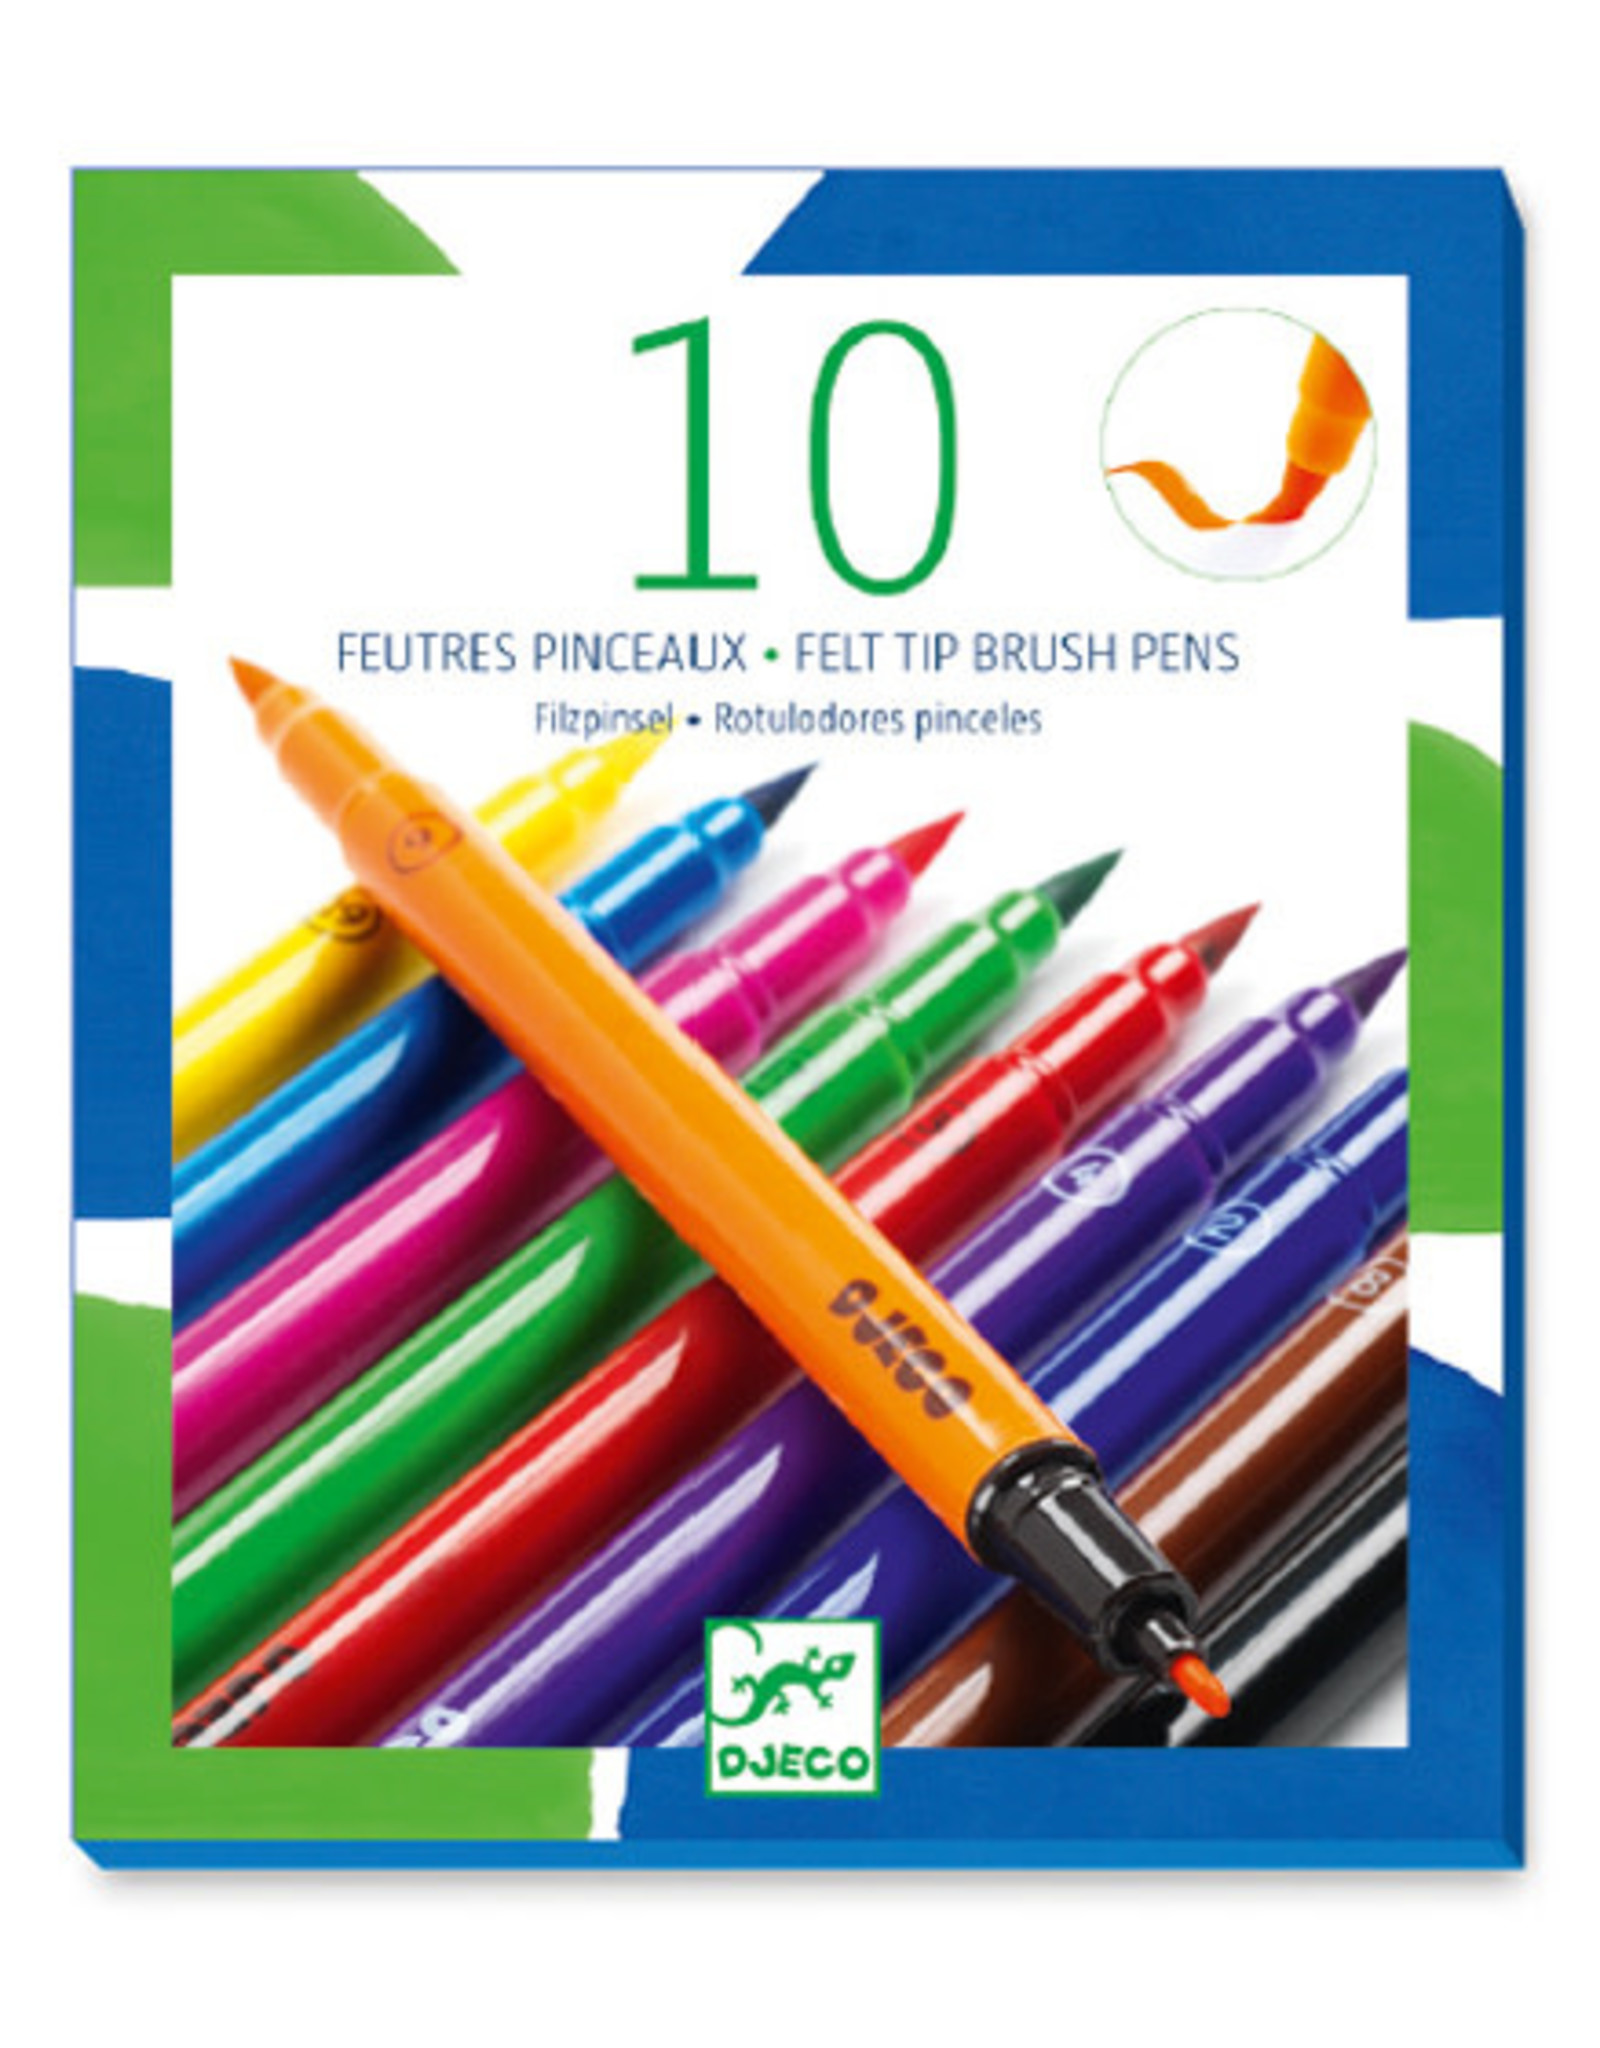 Djeco Felt Brush Markers (10pc)